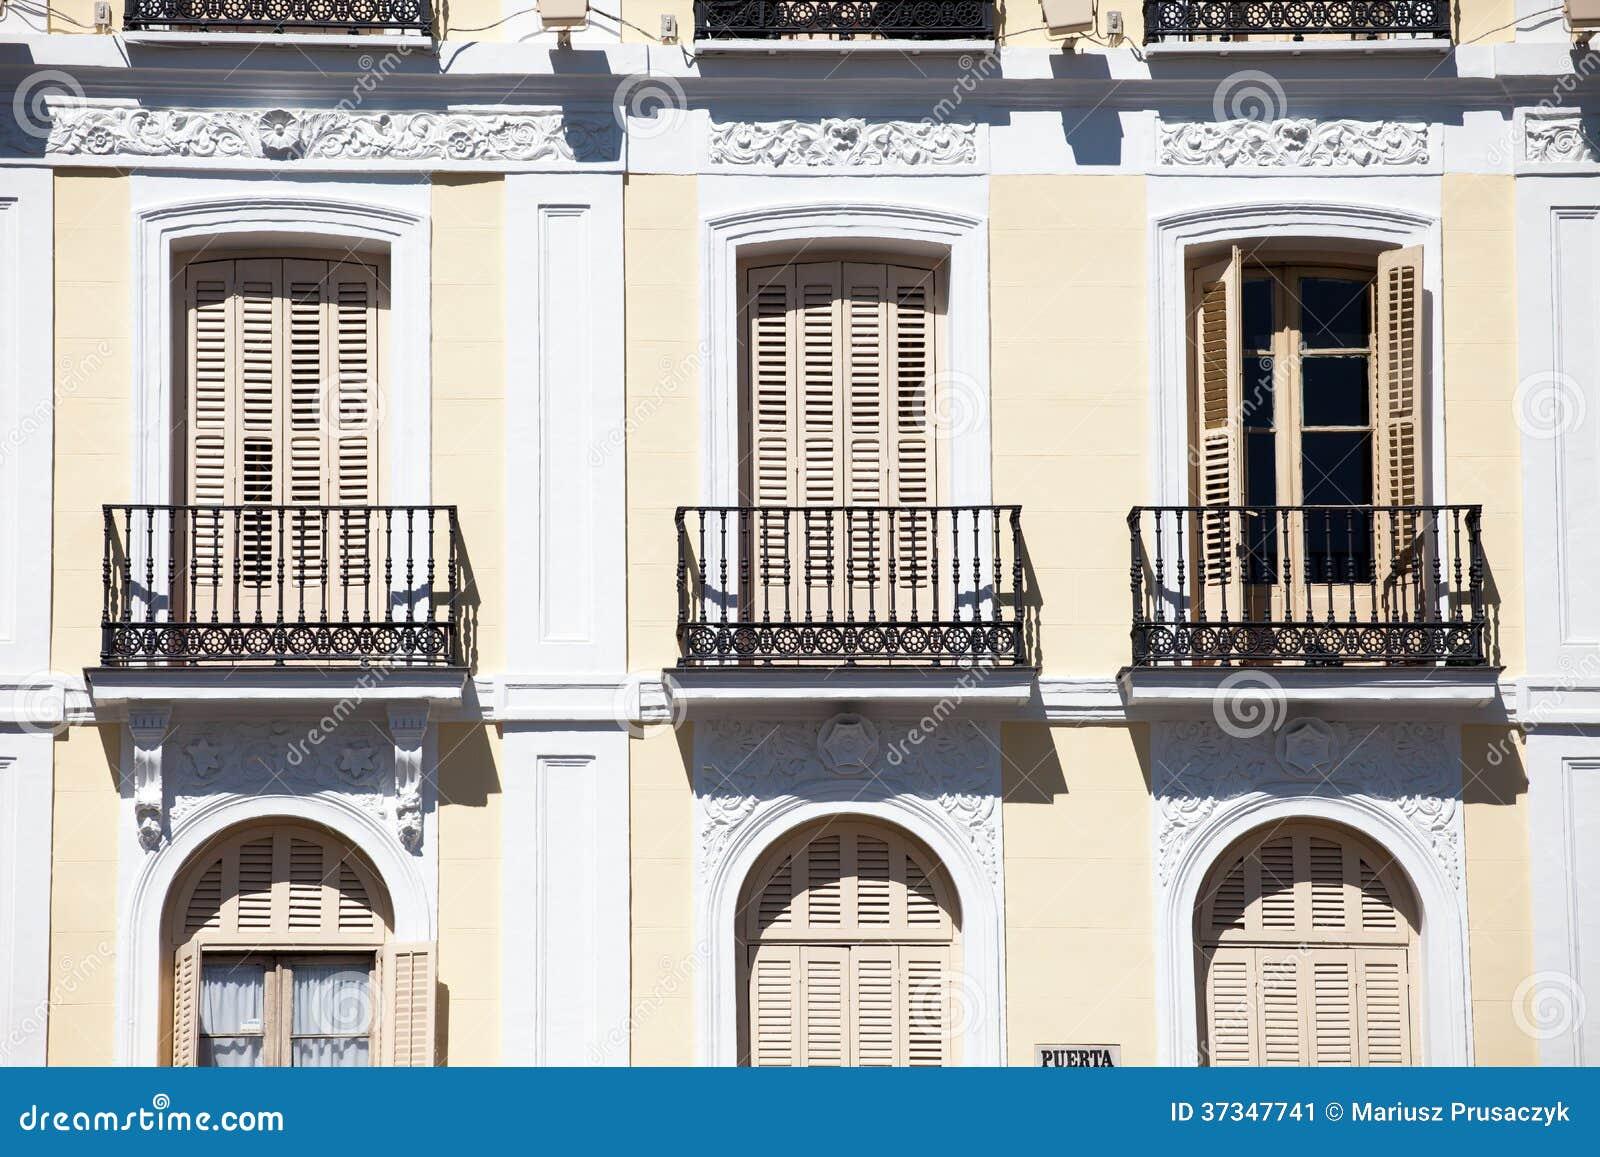 Medelhavs- arkitektur i Spanien. Gammal hyreshus i Madrid.